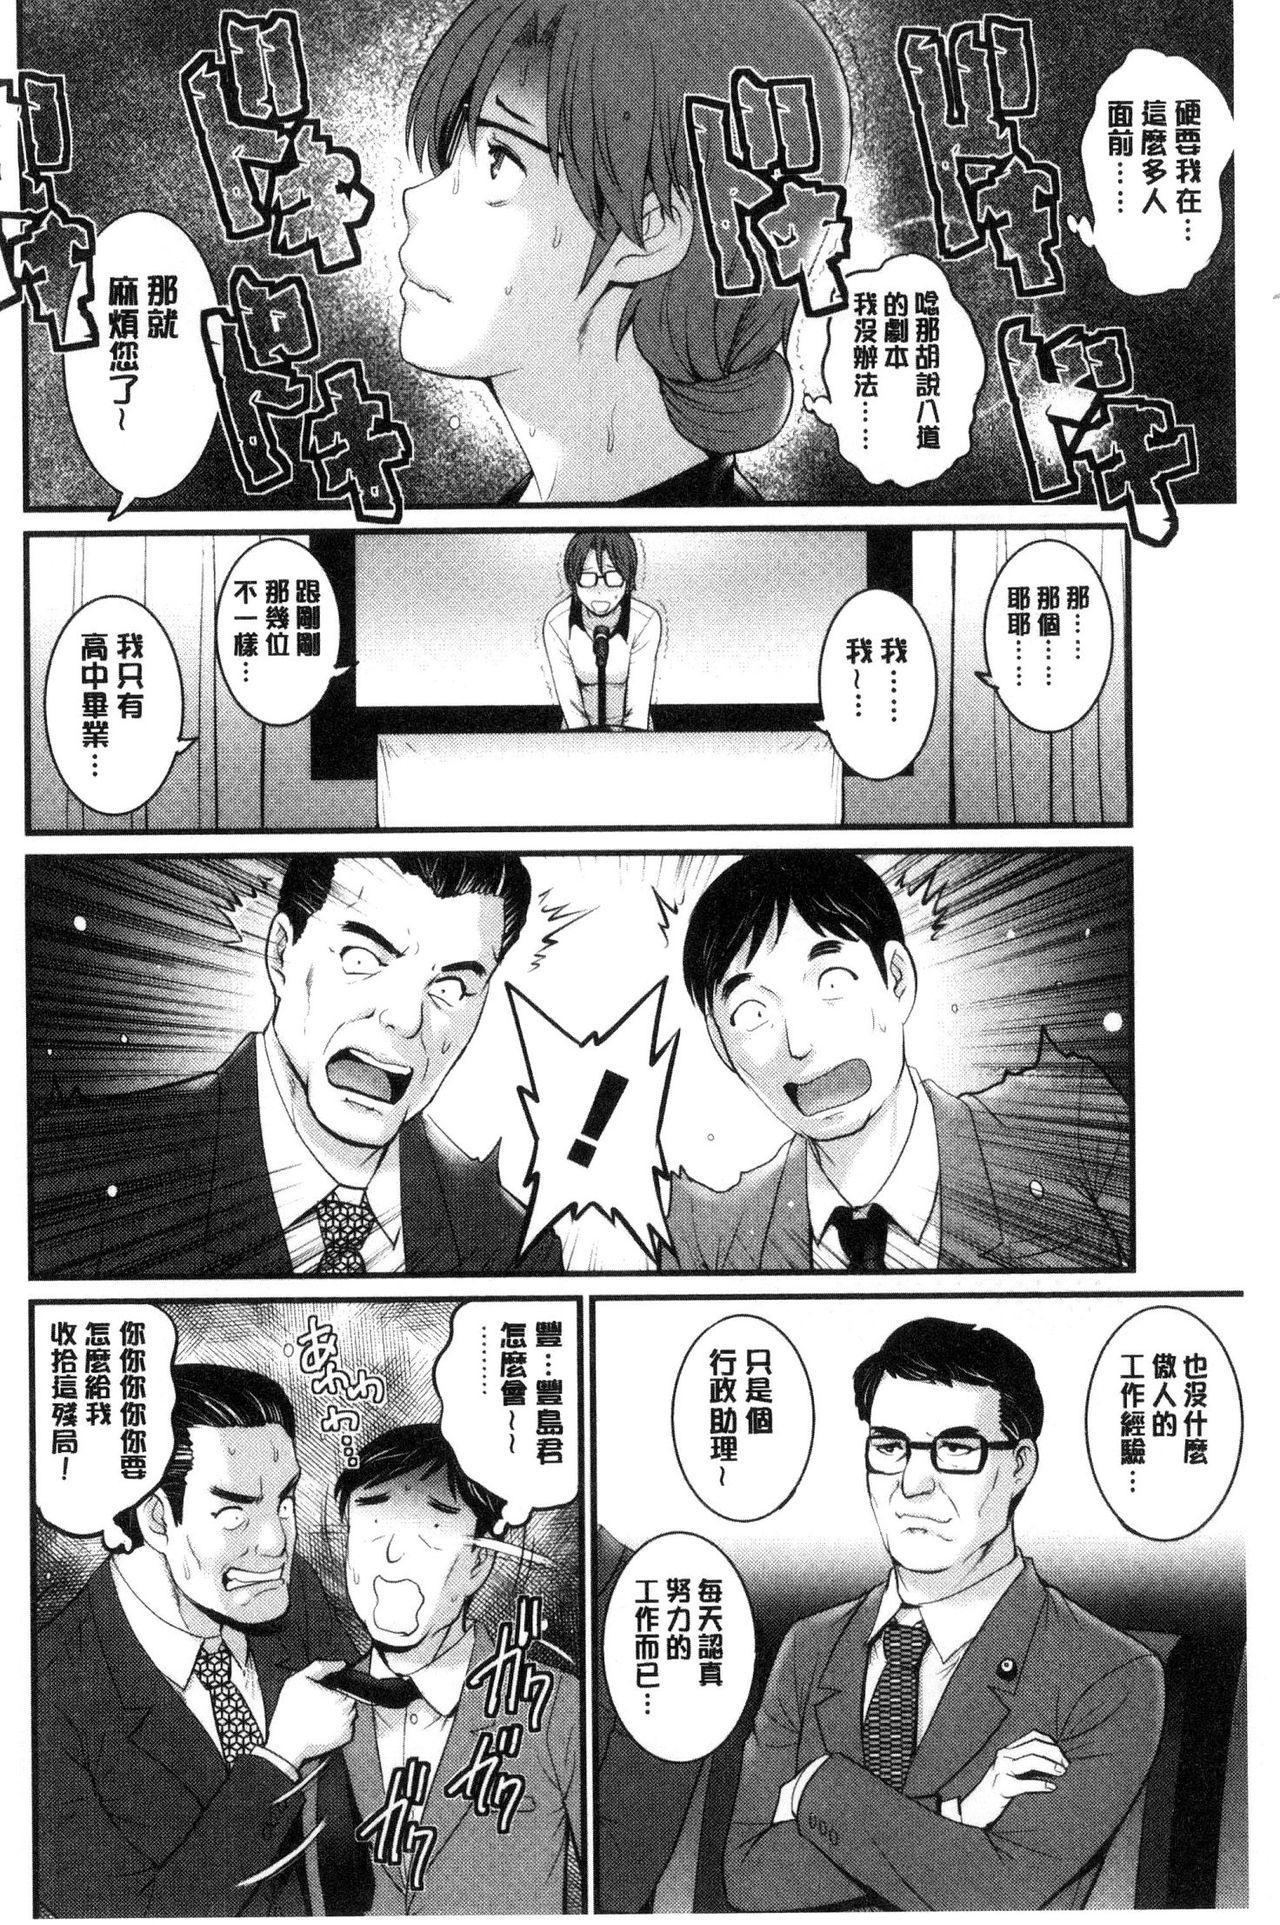 Toshimaku Sodachi no Toshima-san   年增區孕育的豐島小姐 132